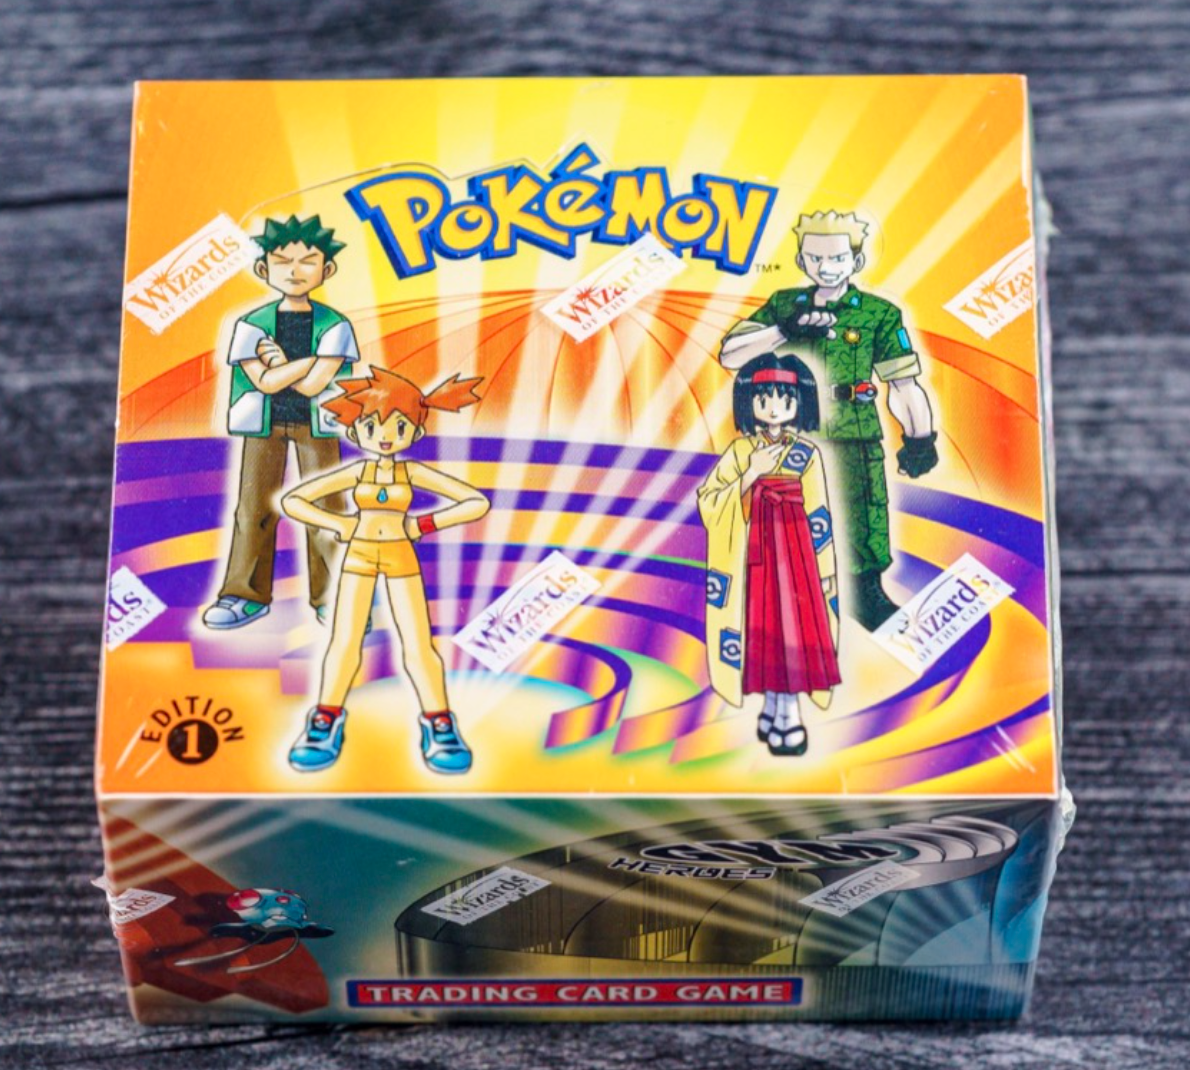 2000 Pokémon Gym Heroes Booster Box (1st Ed.)